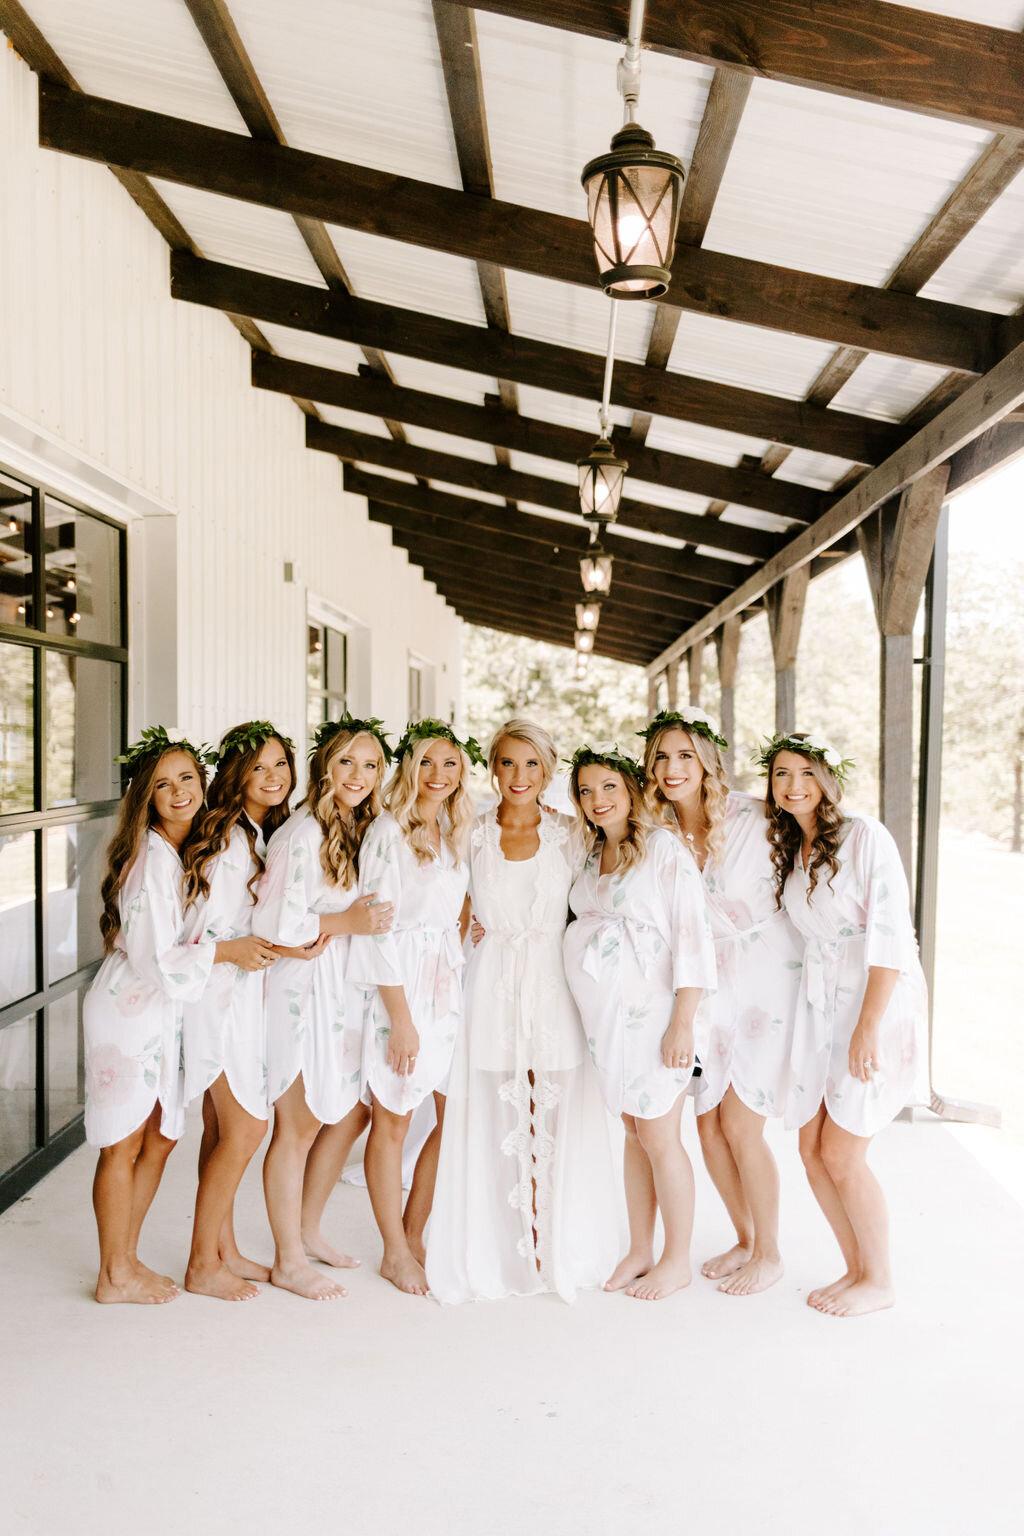 Tulsa White Barn Wedding Venue Outdoor Ceremony 61.JPG